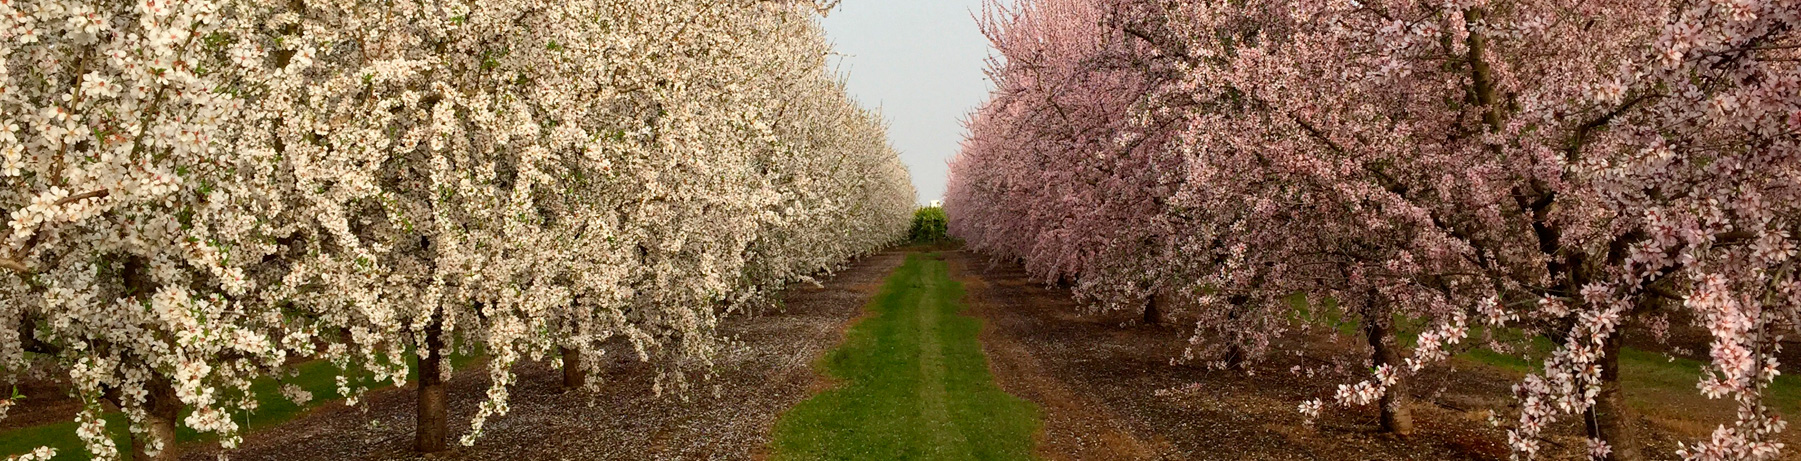 Agroindustria - Grupo Jannone